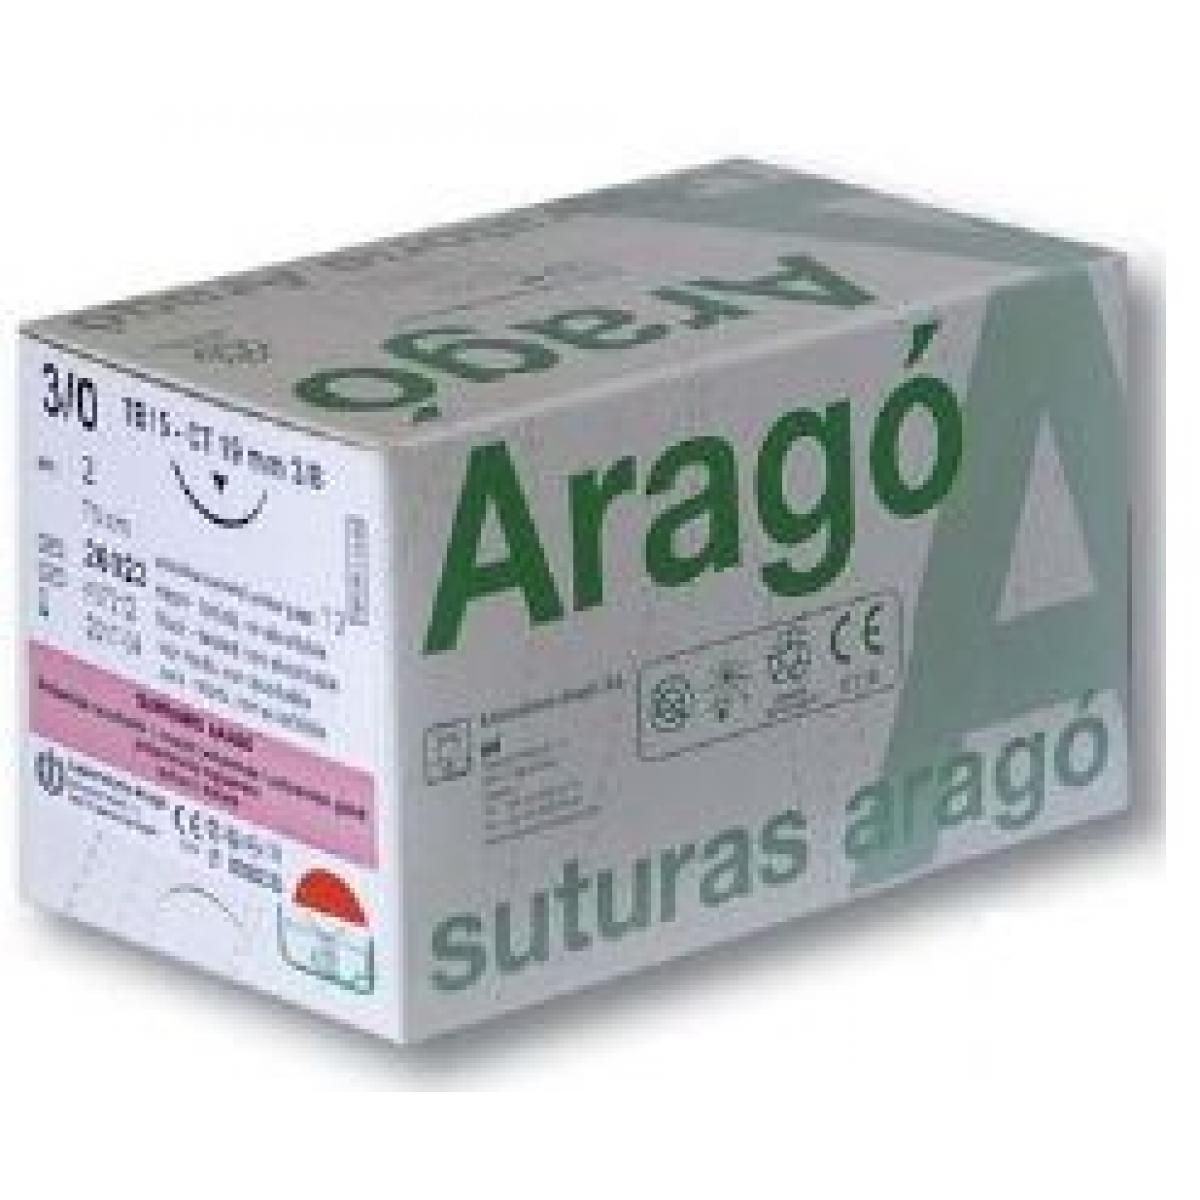 SUTURA ARAGO SUPRAMID 4 0 TB15 36U -